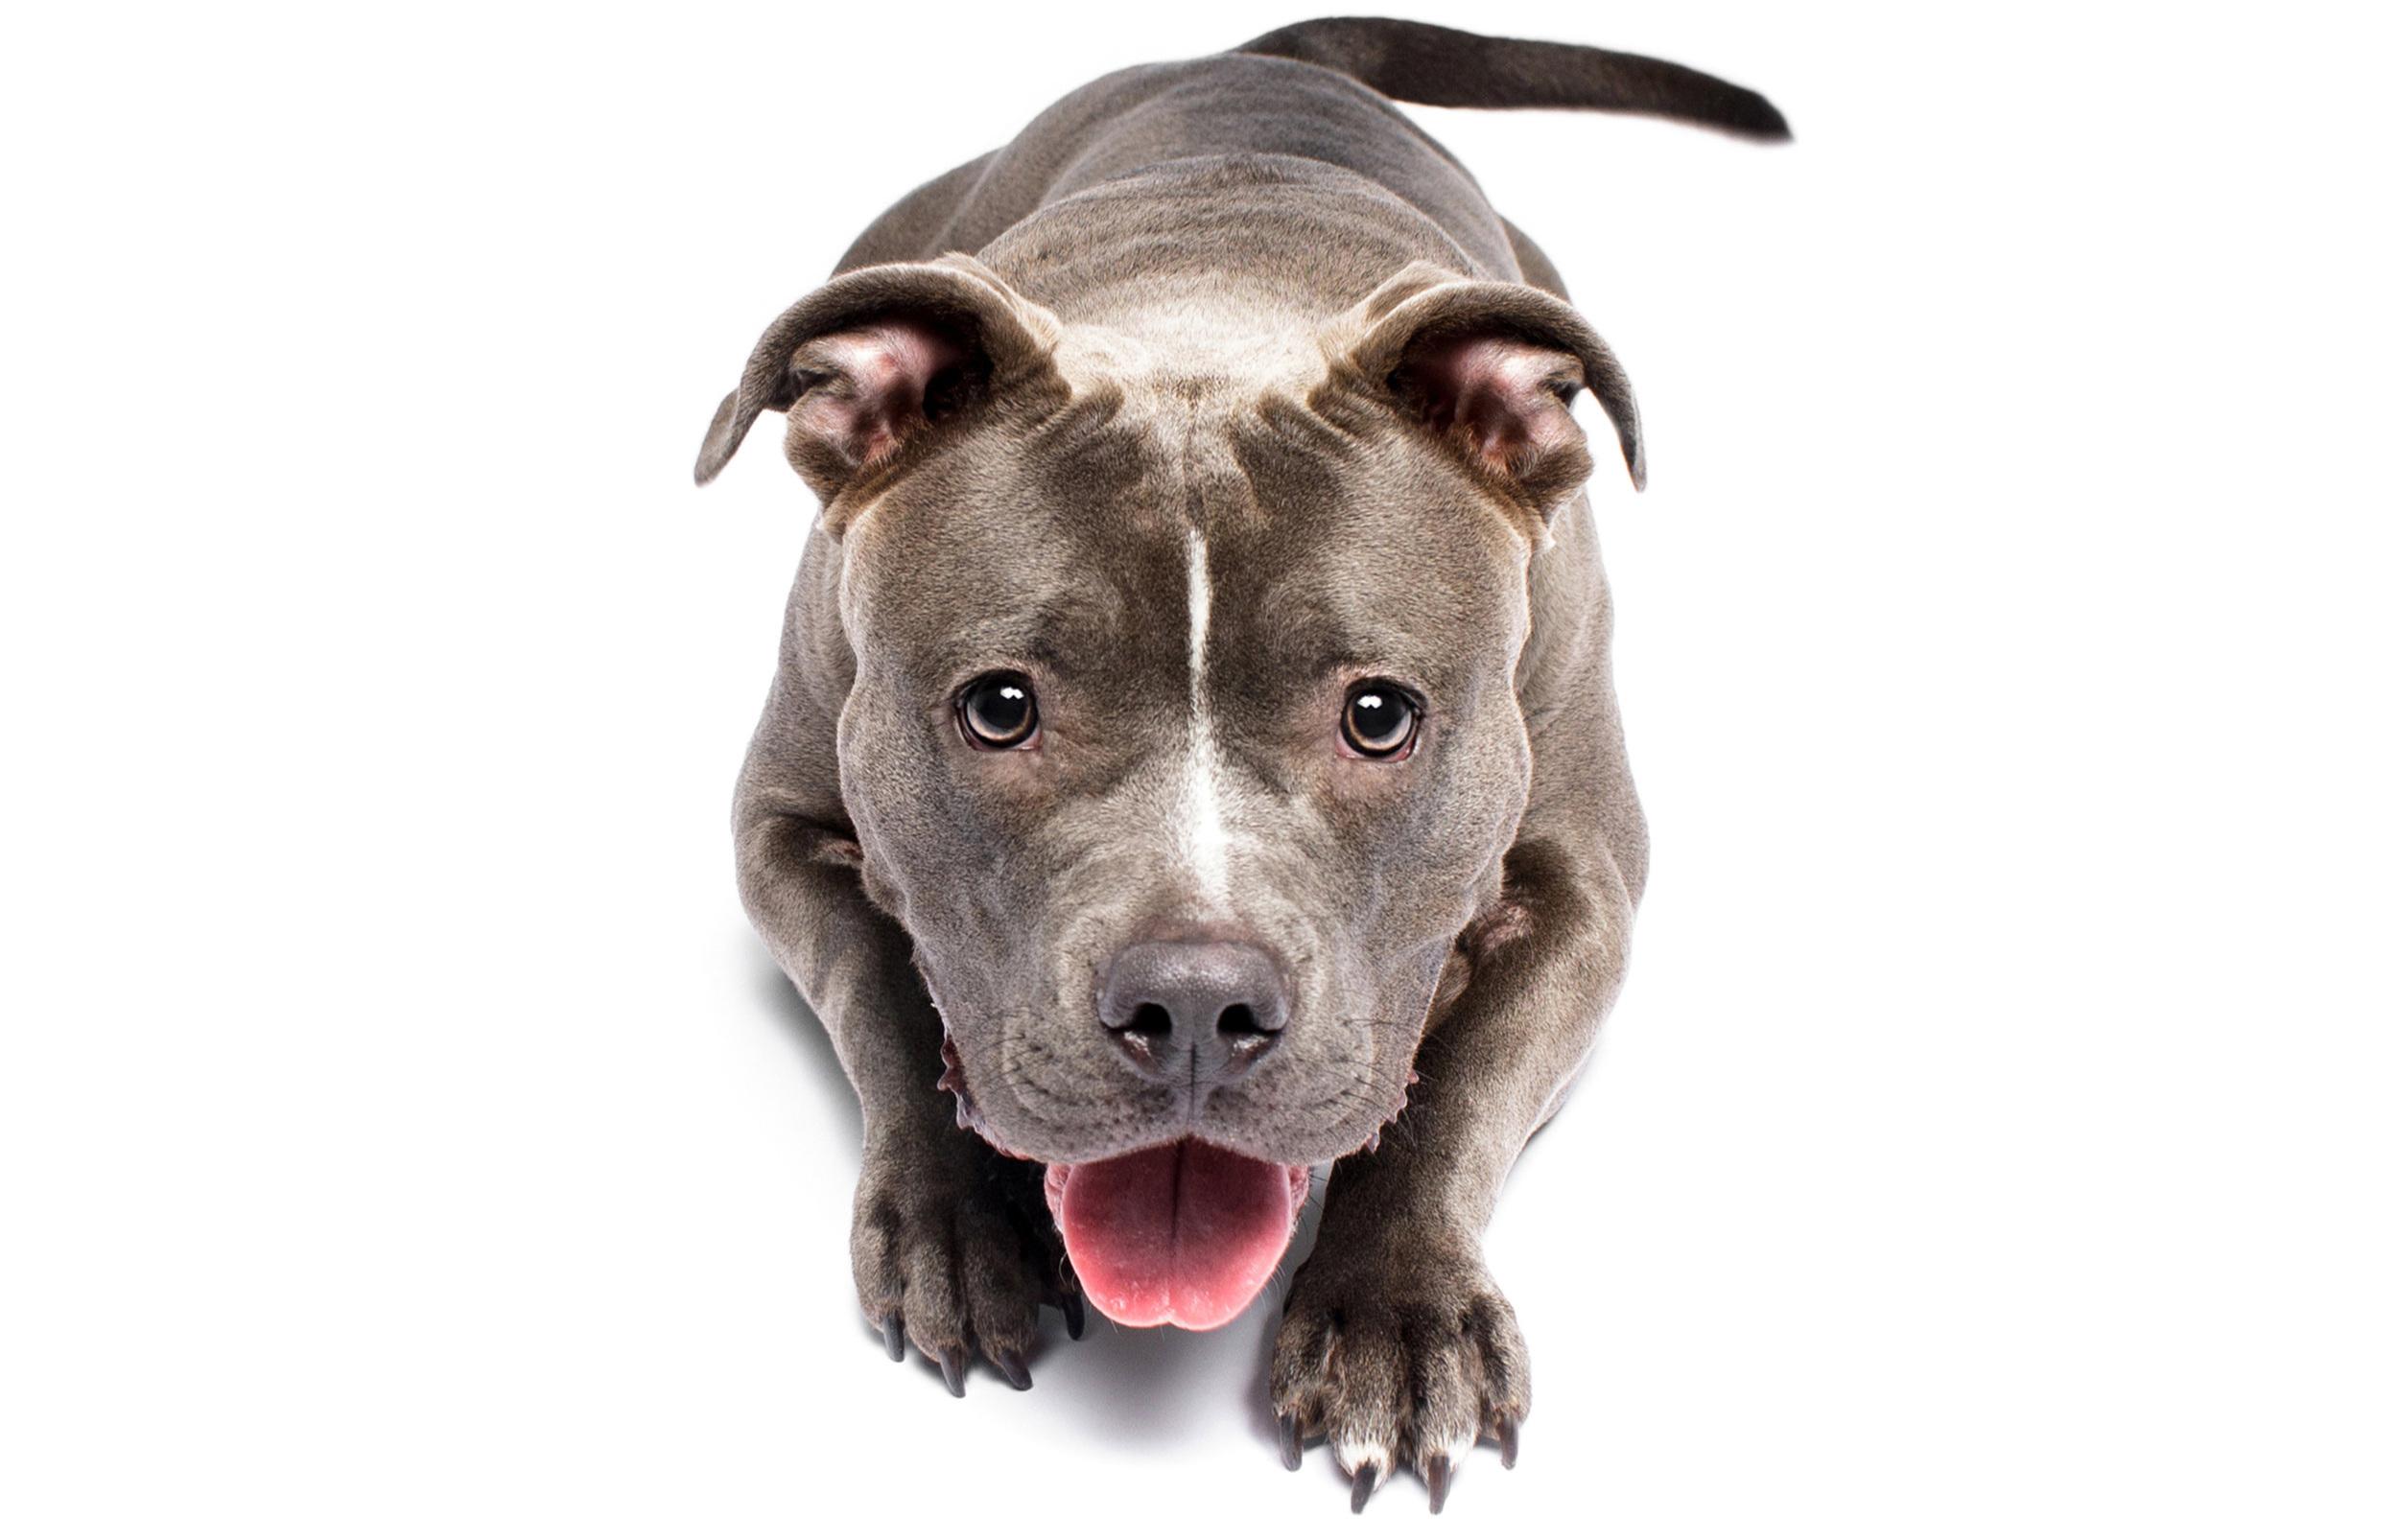 Portrait of American Bulldog/Bully Posing in Studio by Brent D'Silva the Dog Photographer